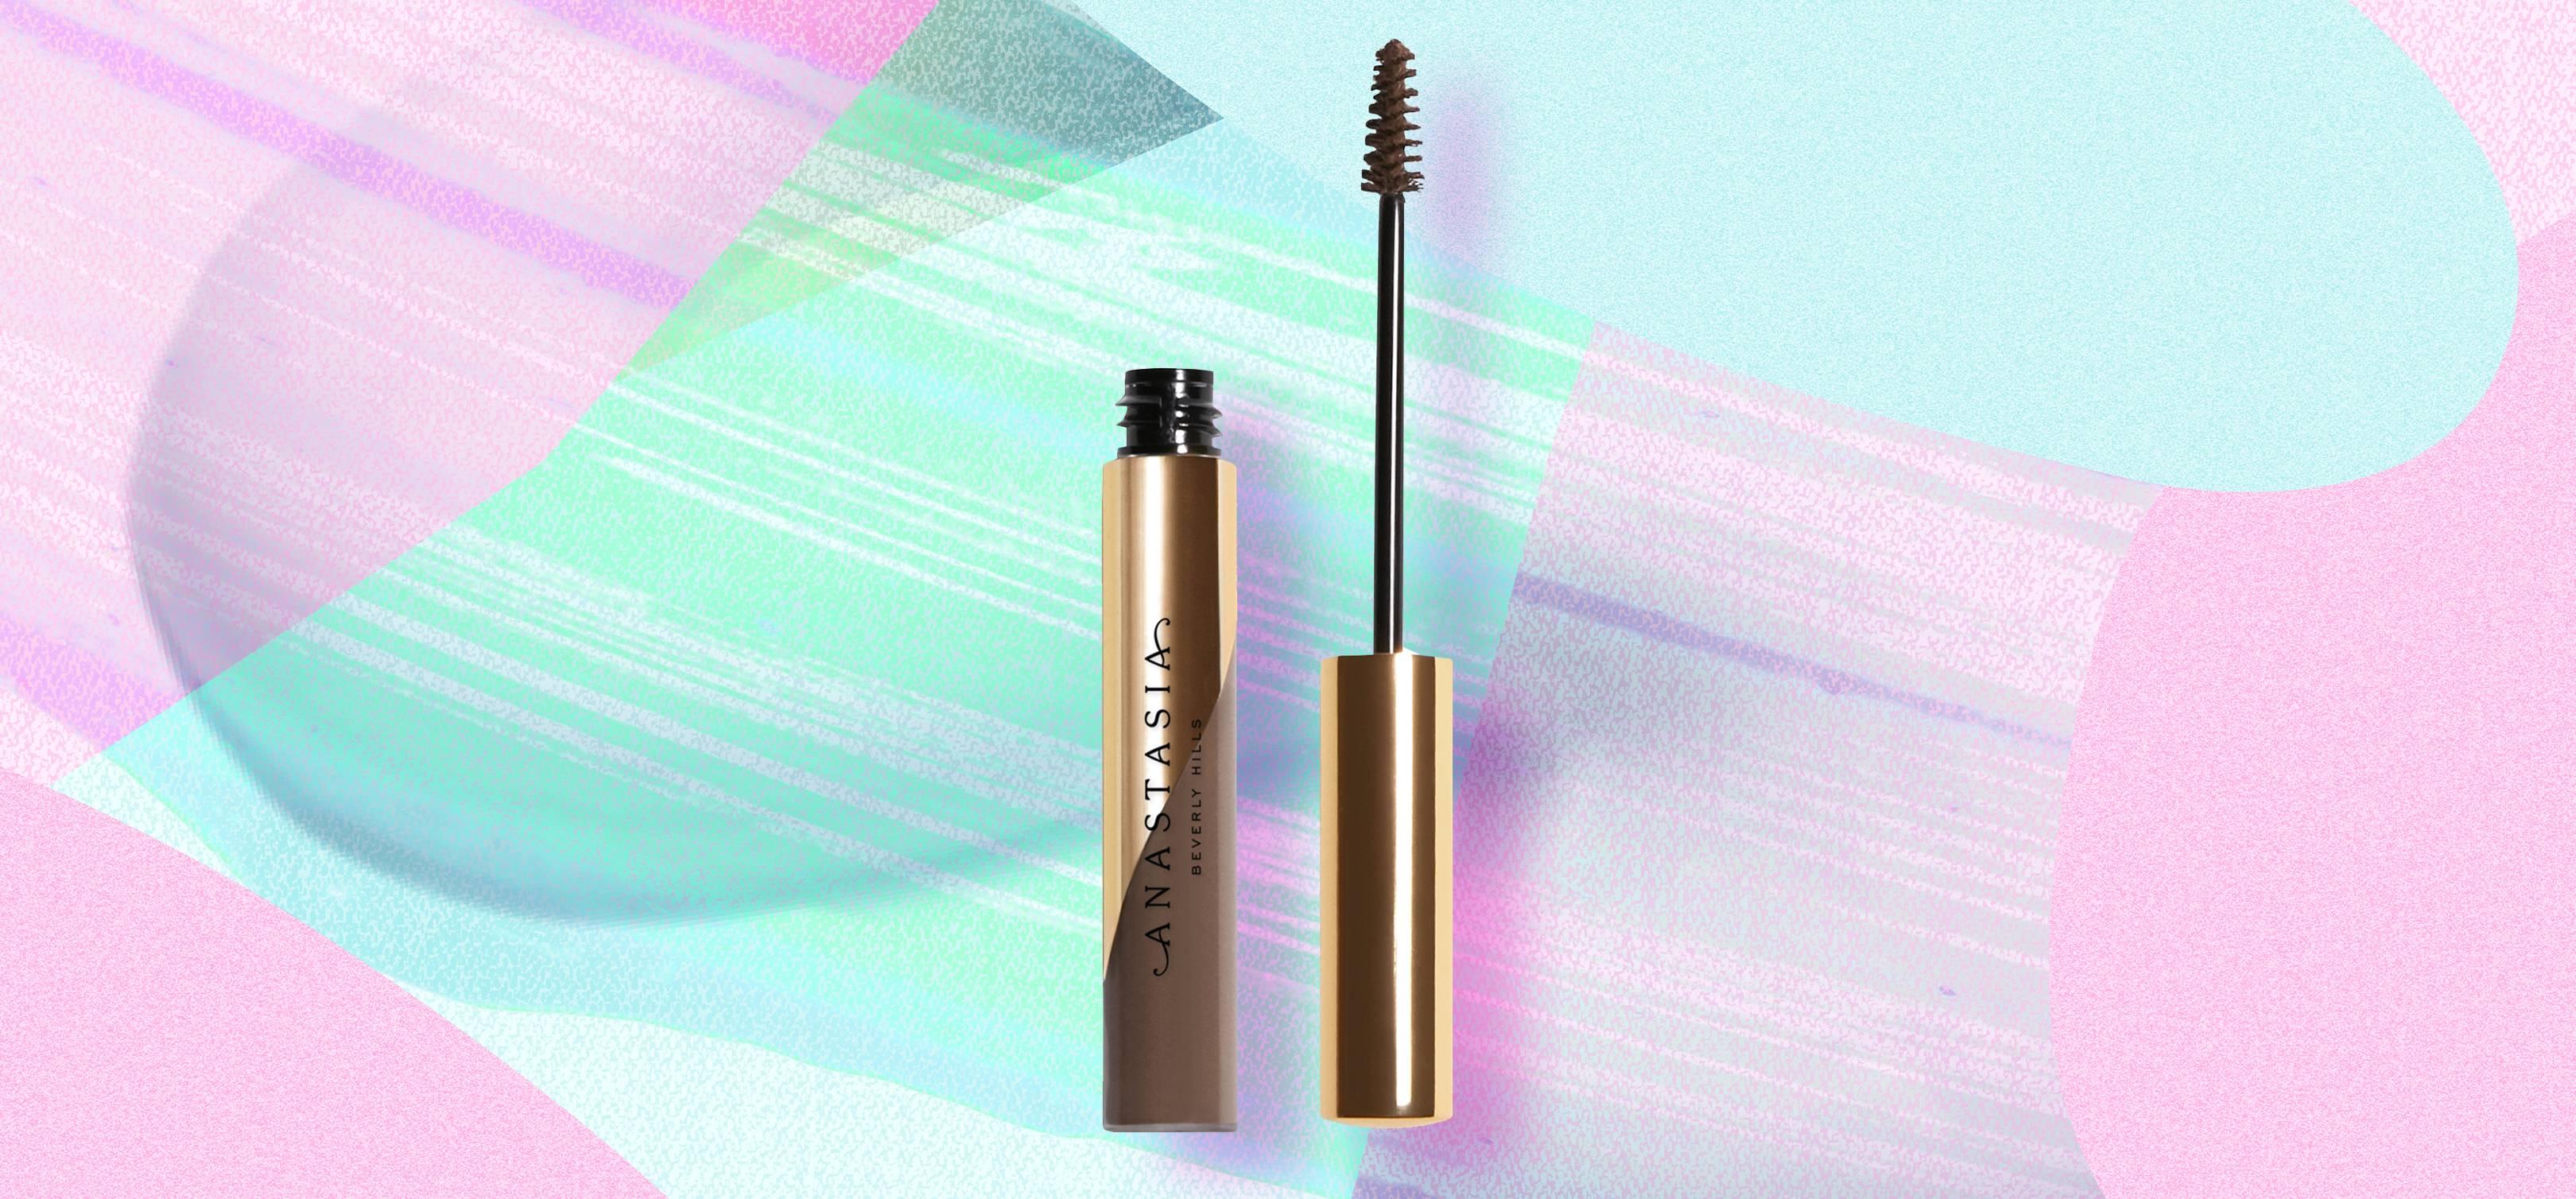 Best Eyebrow Products: Top Eyebrow Pencils, Brow Kits, Gels & Powders | Glamour UK